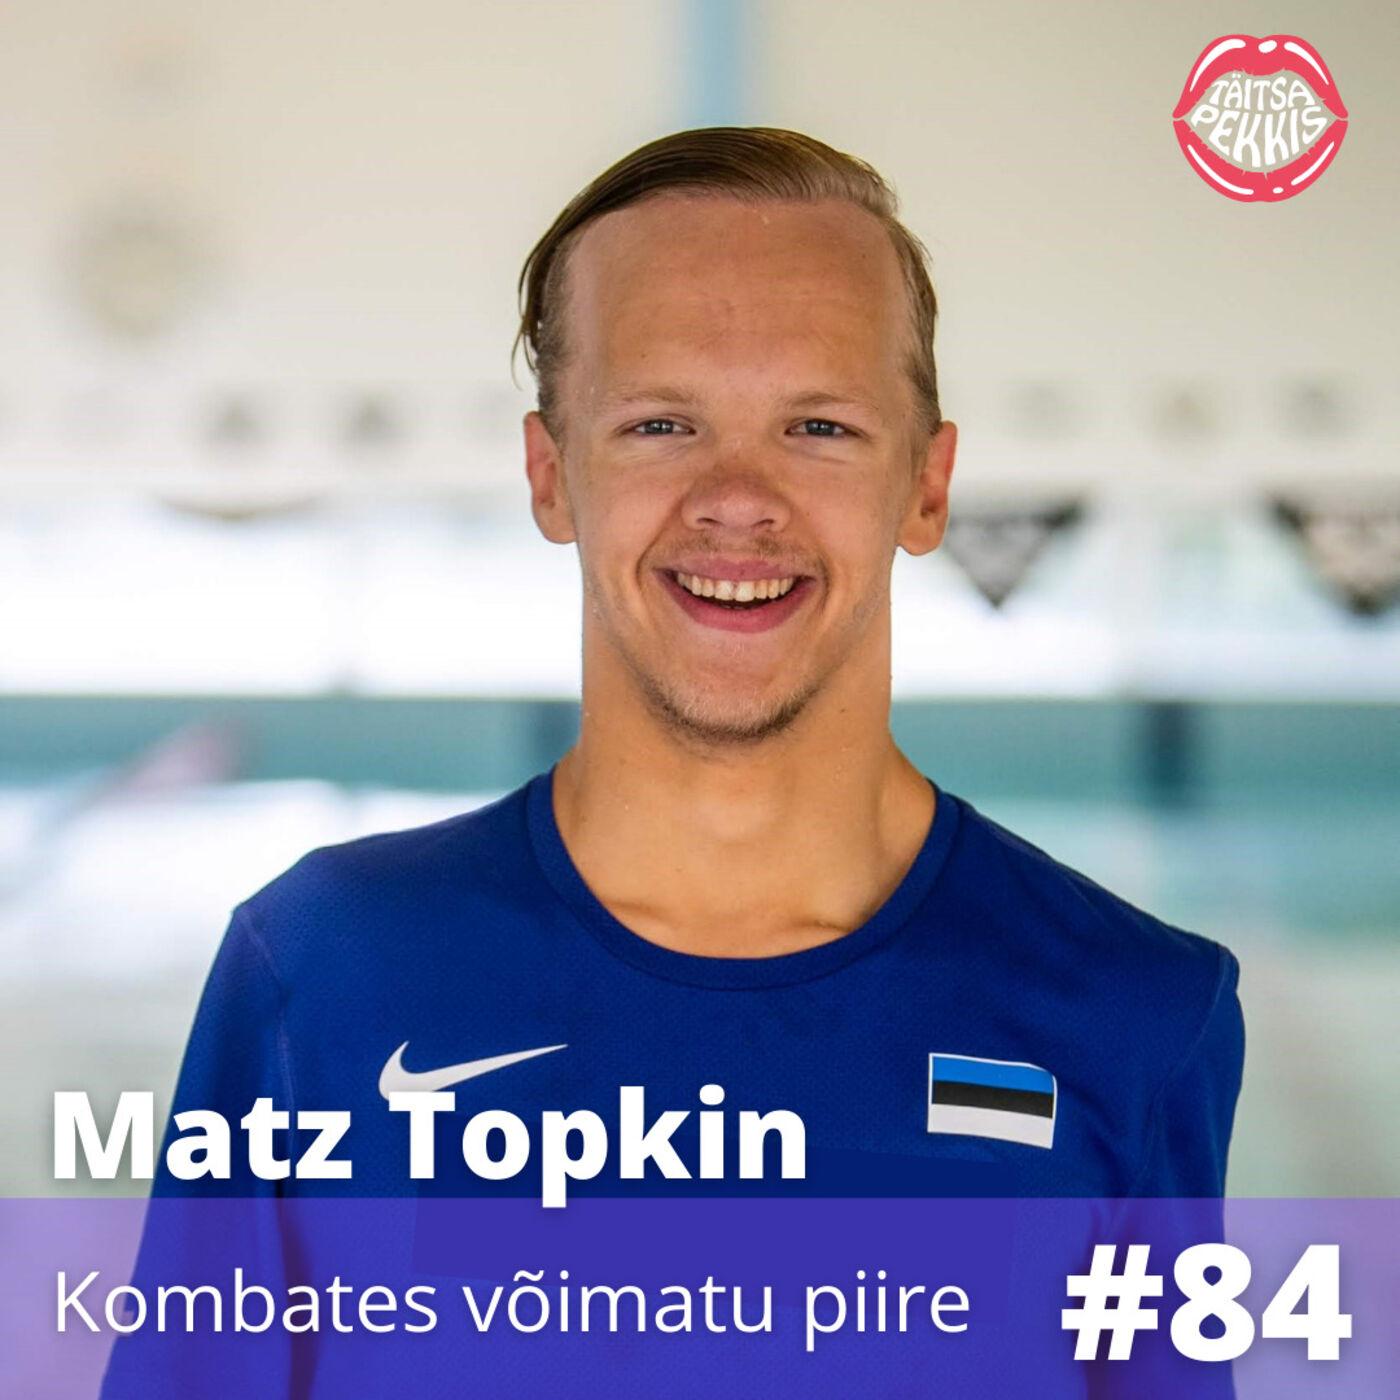 #84 - Matz Topkin - Kombates võimatu piire